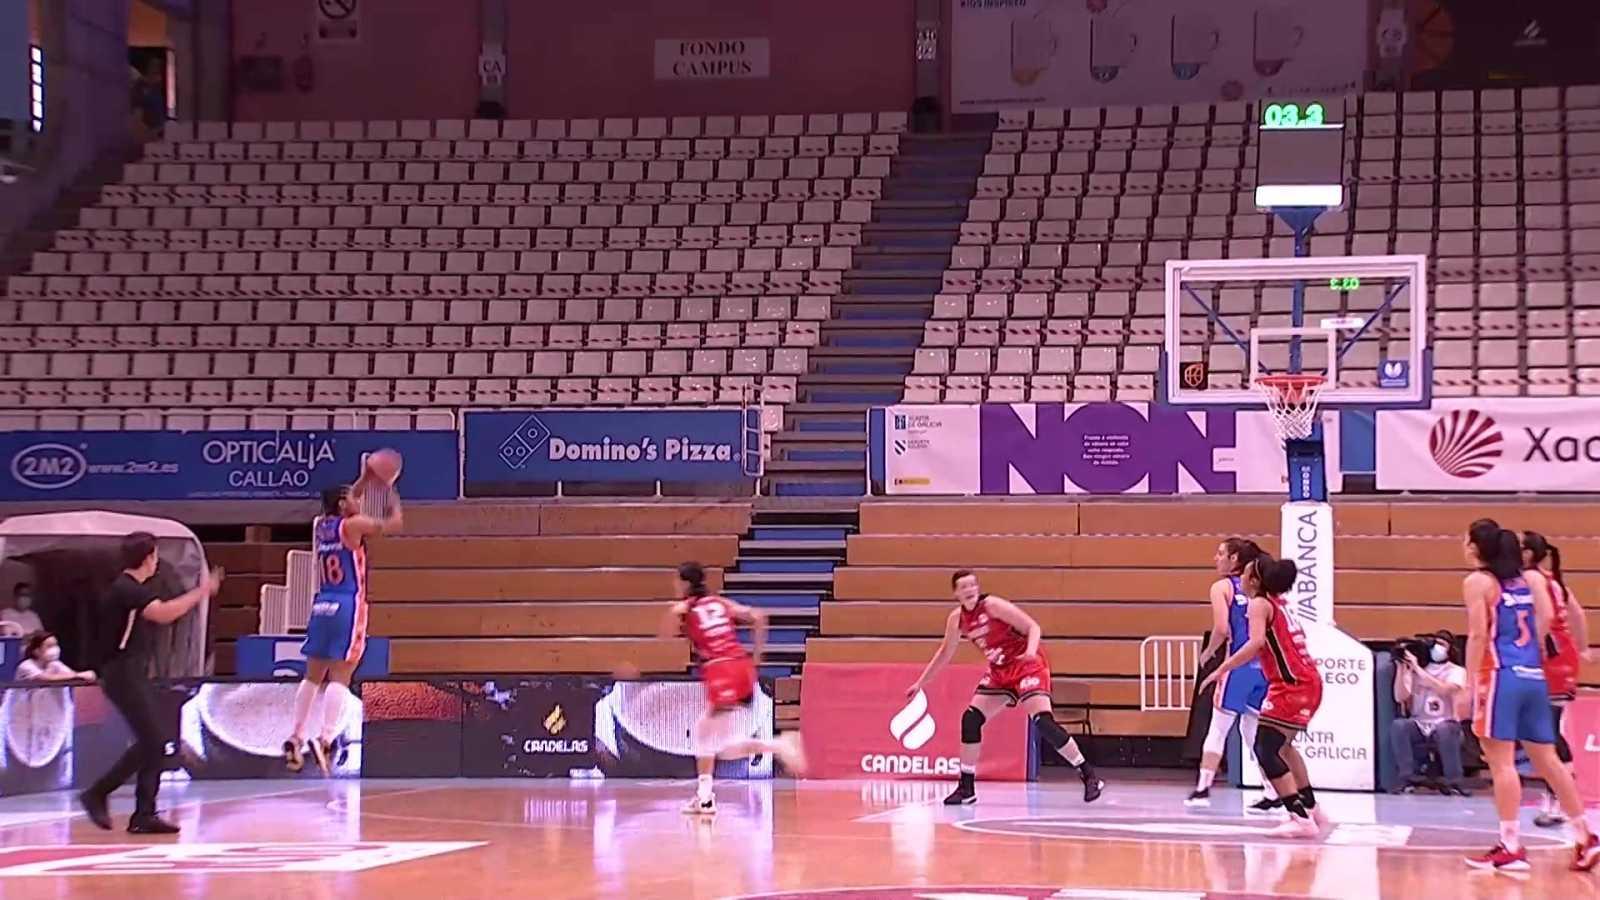 Baloncesto - Liga femenina Endesa. Play off 1/4 Final ida: D.M. Ensino - Valencia B.C - ver ahora